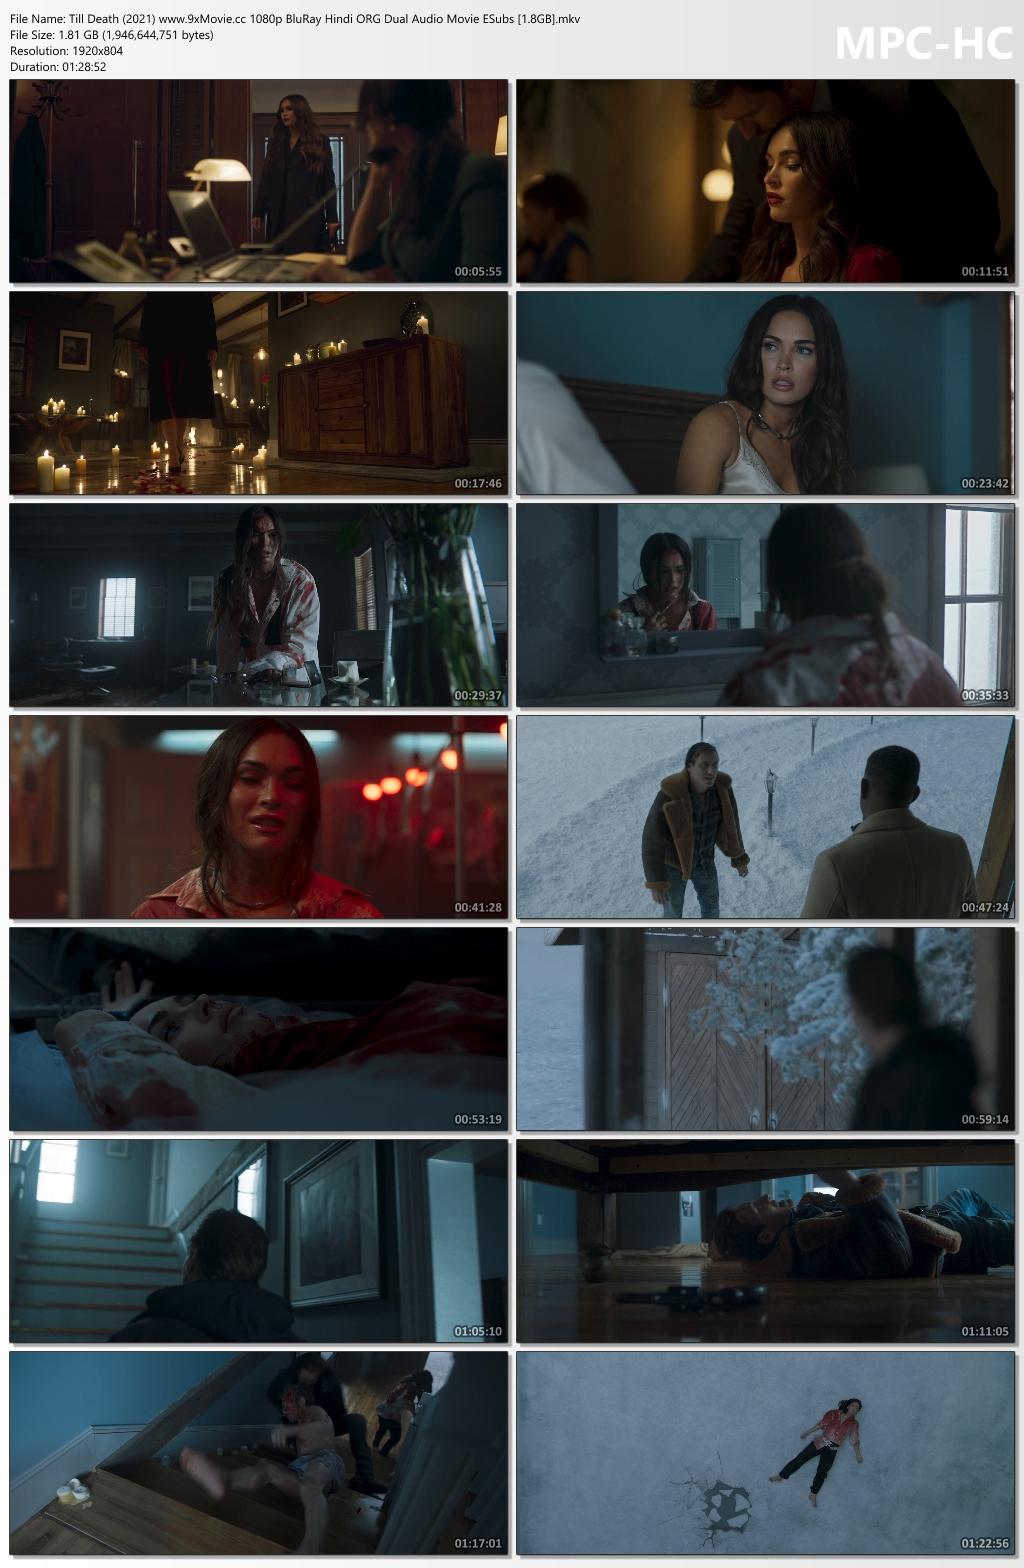 Till-Death-2021-www-9x-Movie-cc-1080p-Blu-Ray-Hindi-ORG-Dual-Audio-Movie-ESubs-1-8-GB-mkv